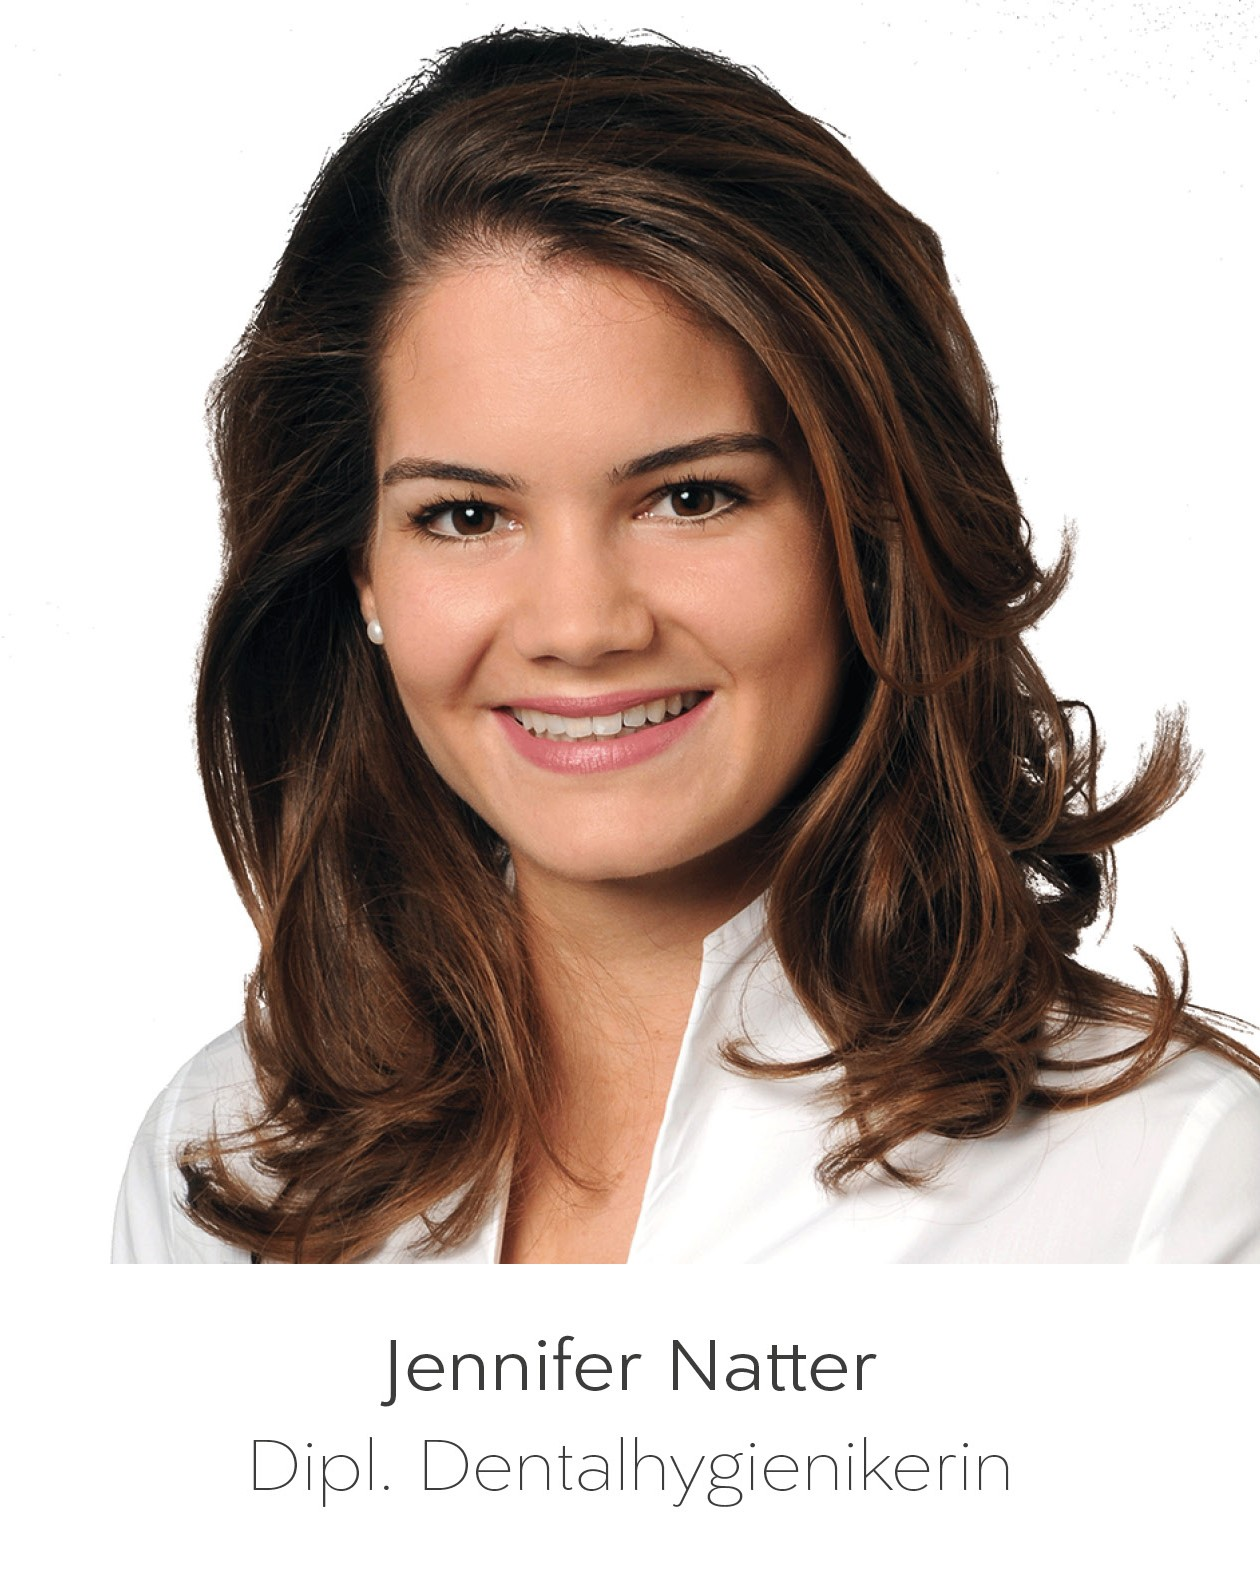 Jennifer Natter